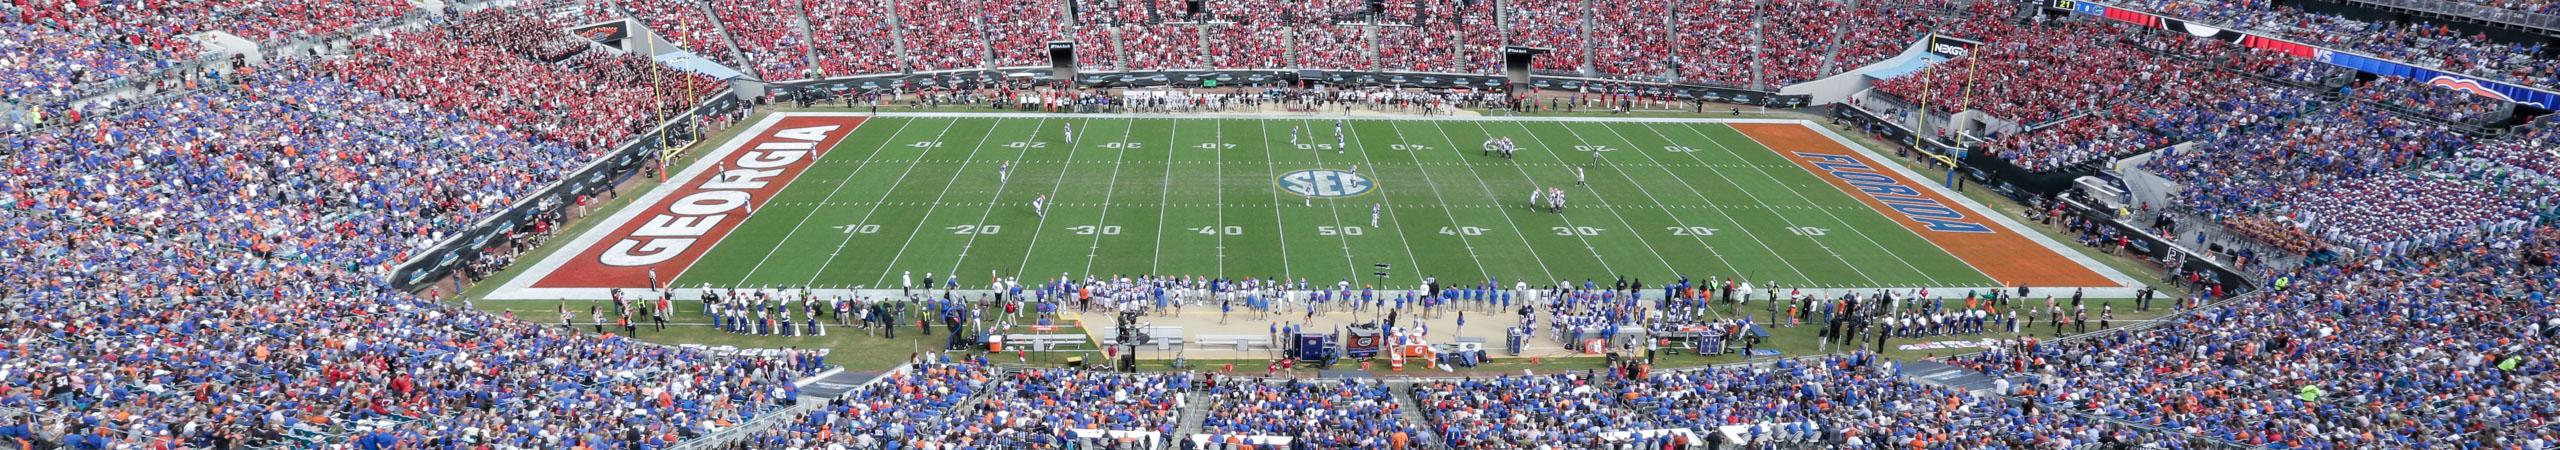 Florida / Georgia Football 2019